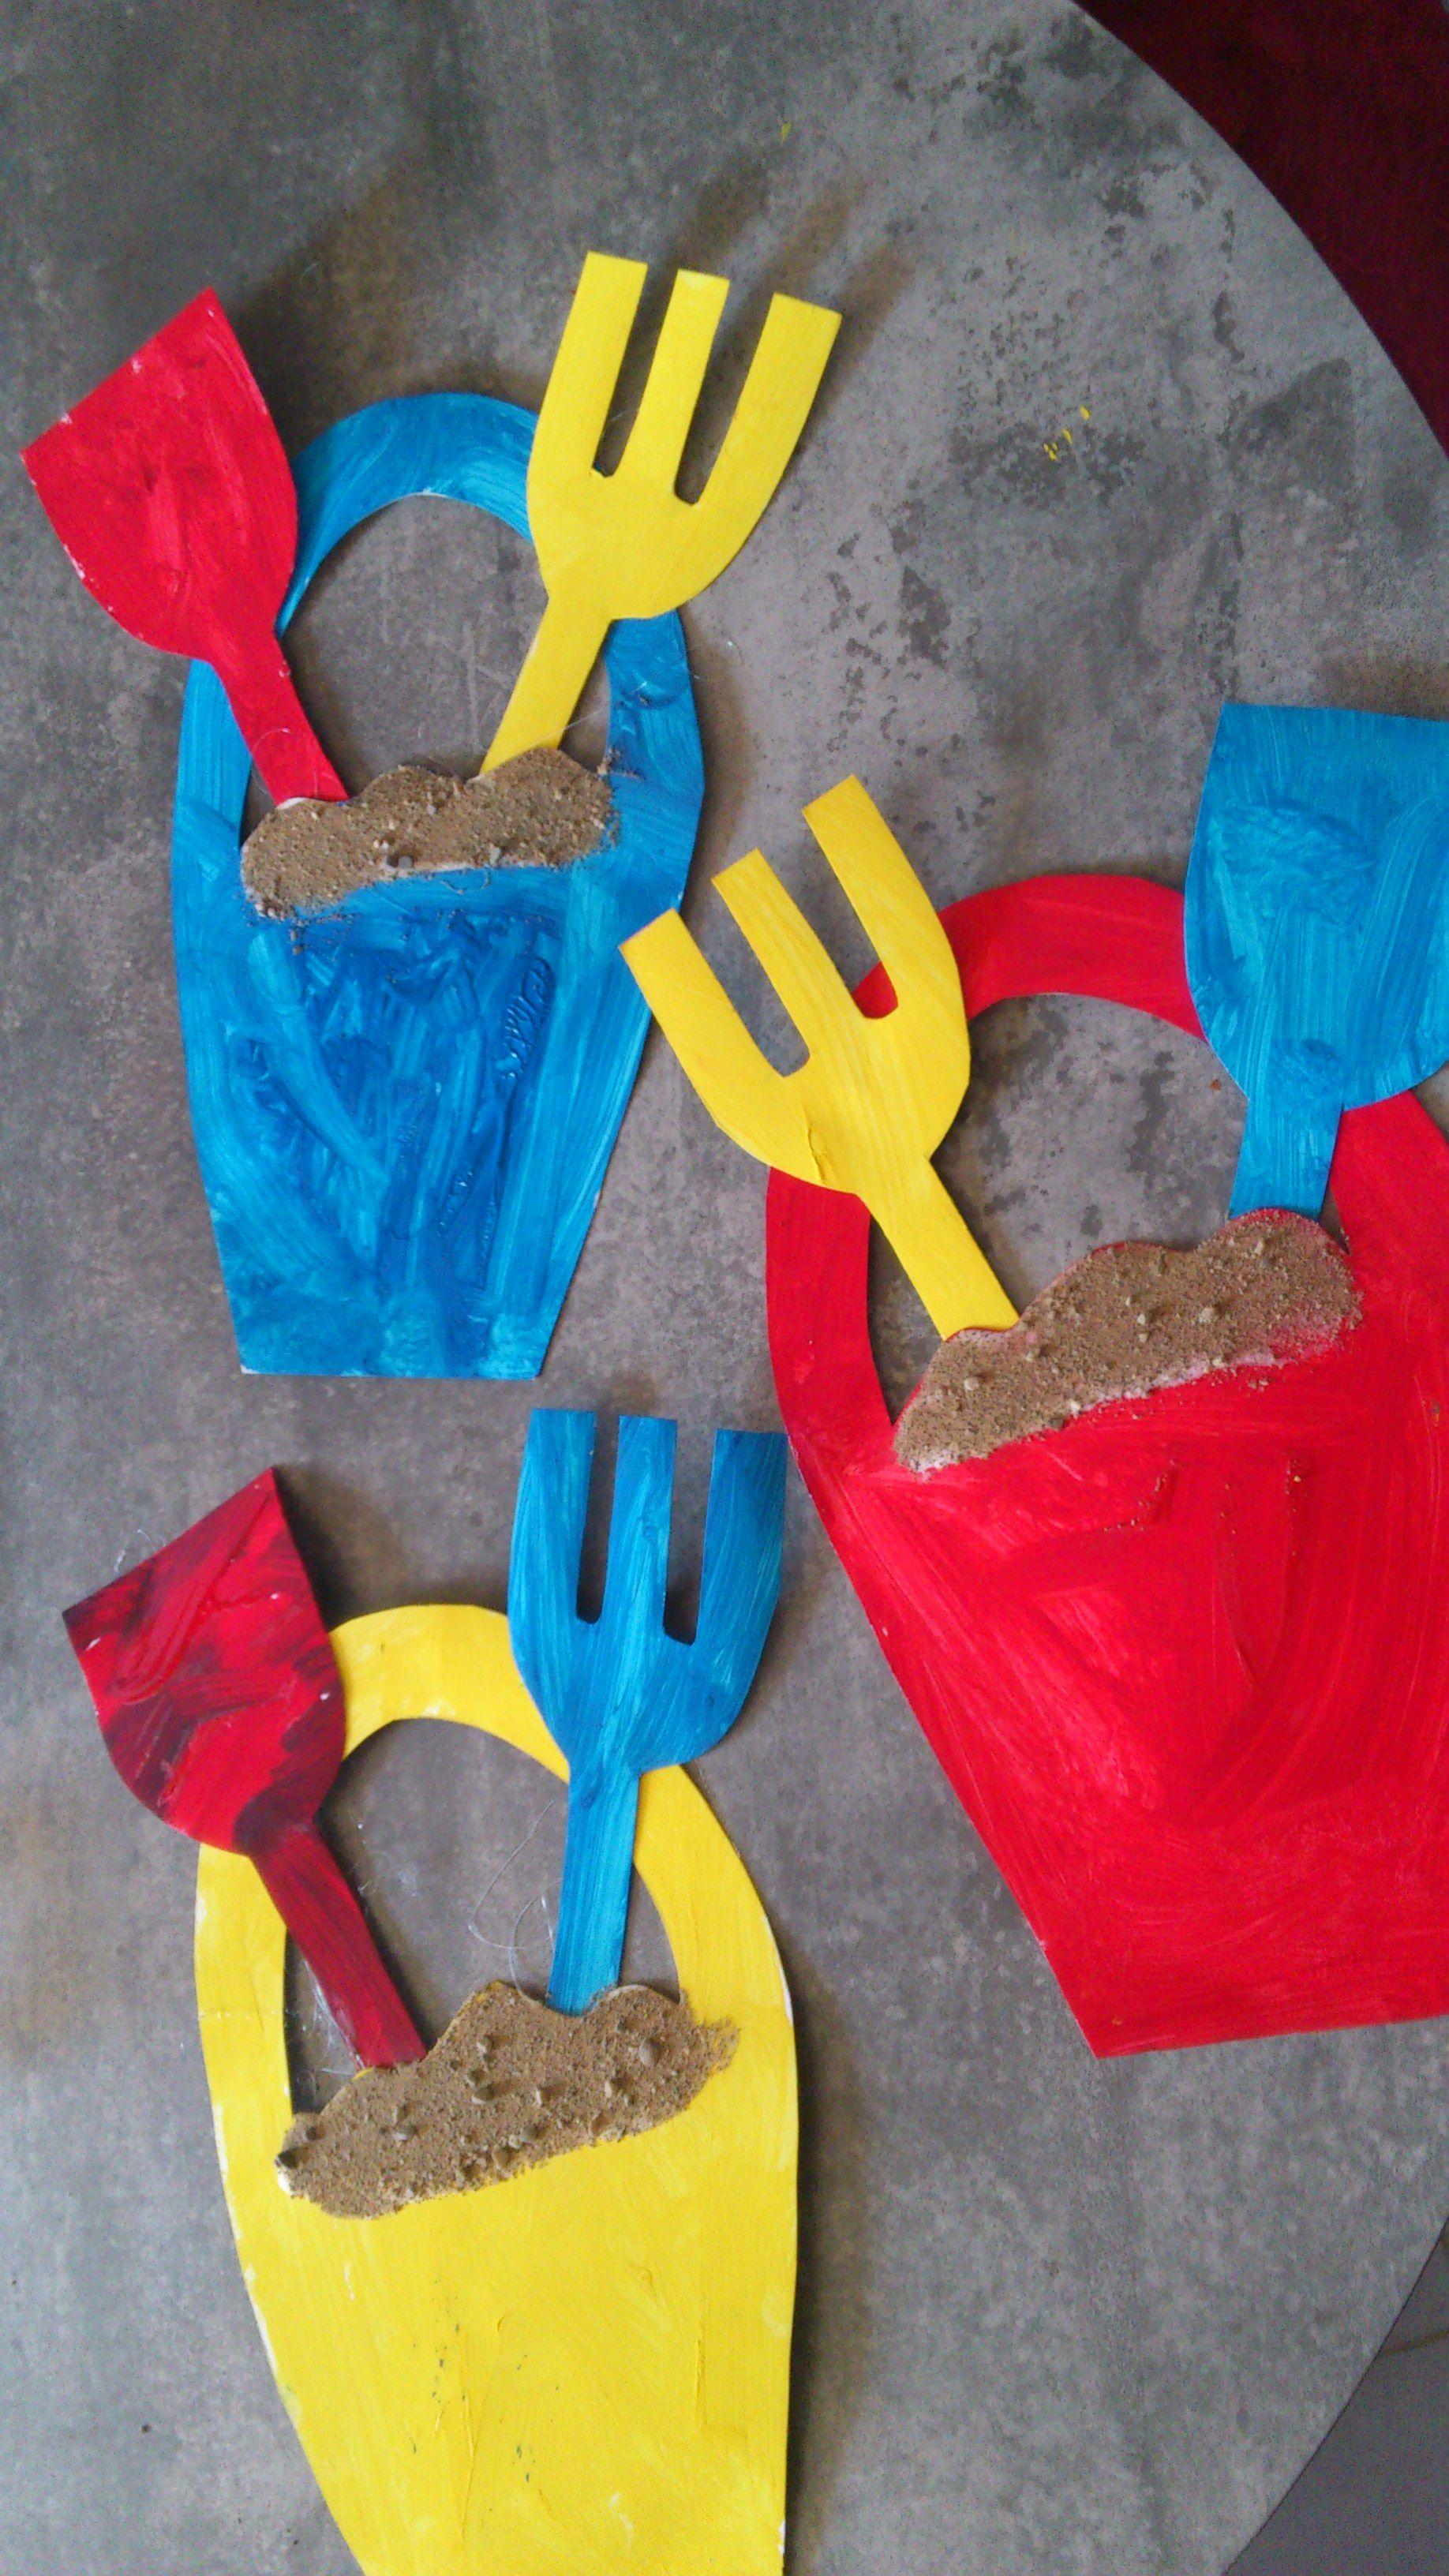 Fabuleux Image du Blog pepetine26.centerblog.net | Busy Preschoolers  LR86